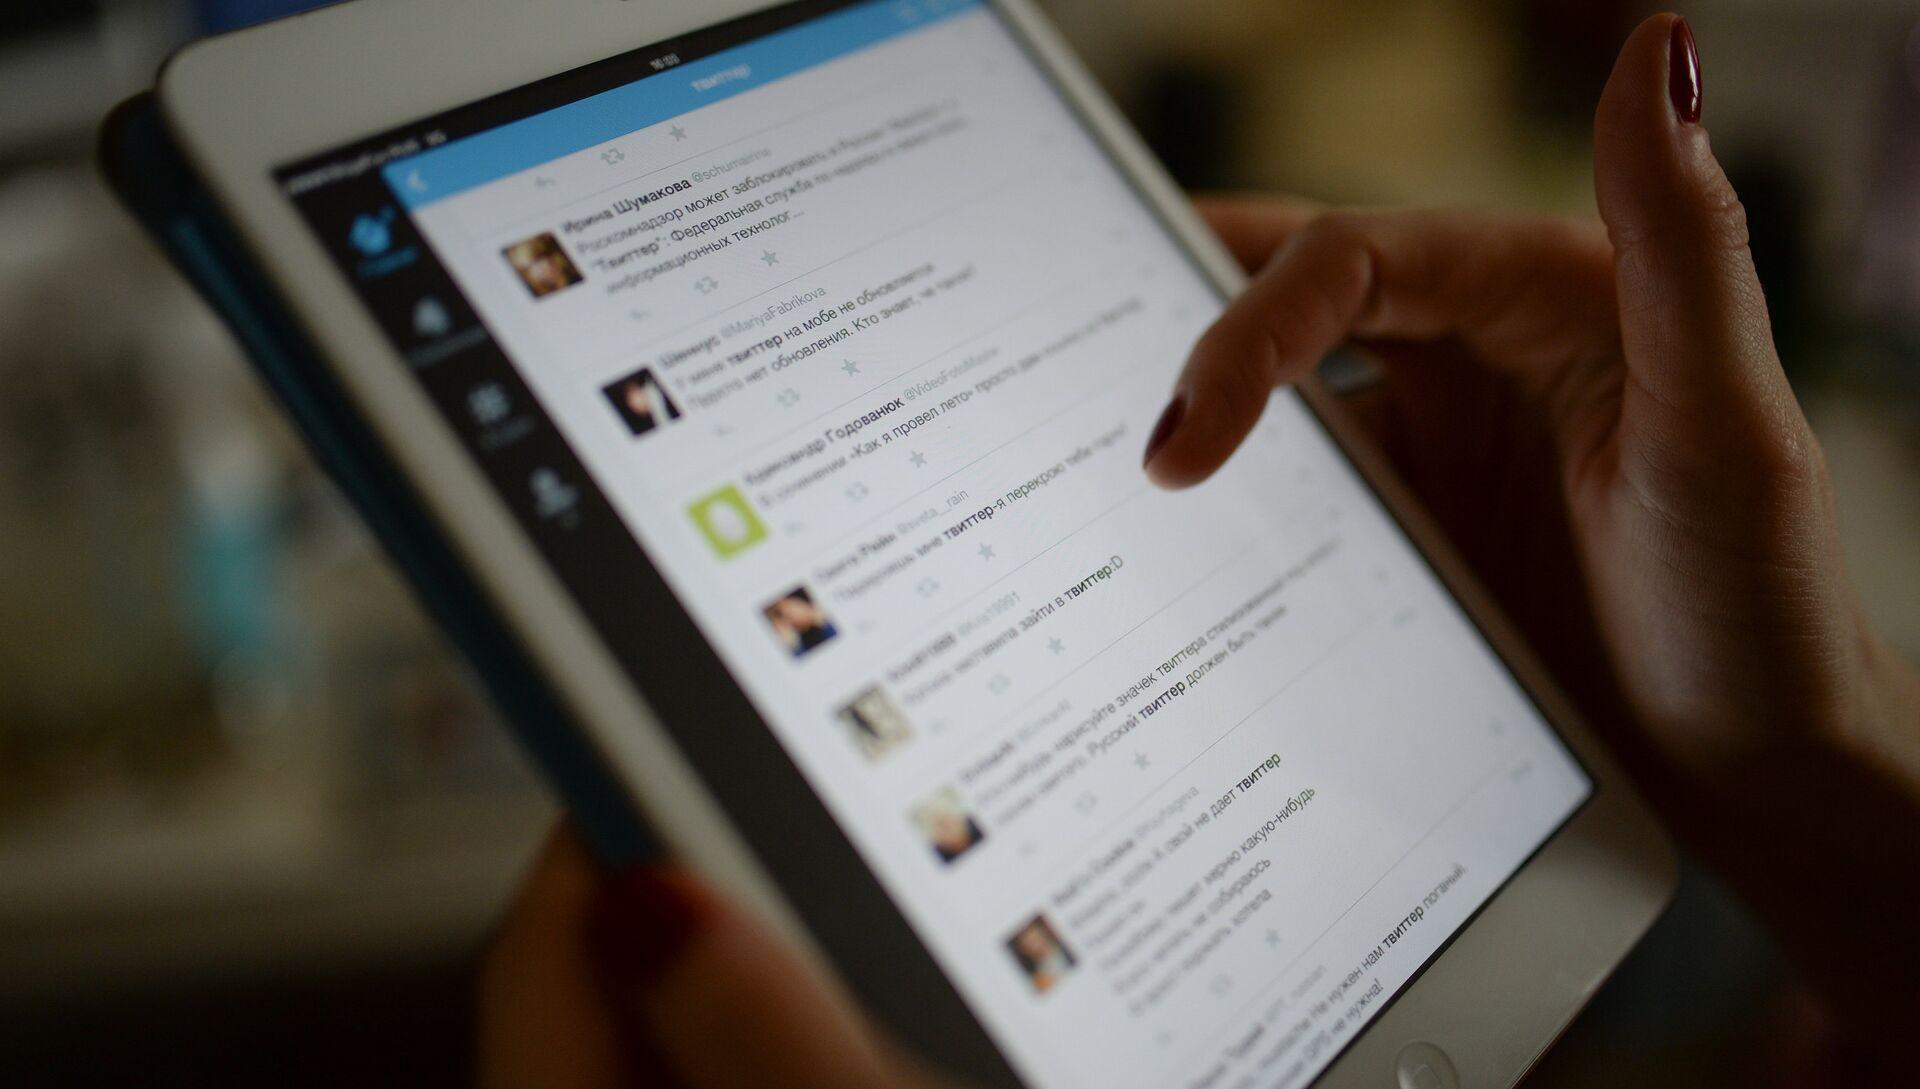 Страница сайта Twitter на экране планшетного компьютера. - РИА Новости, 1920, 20.11.2020